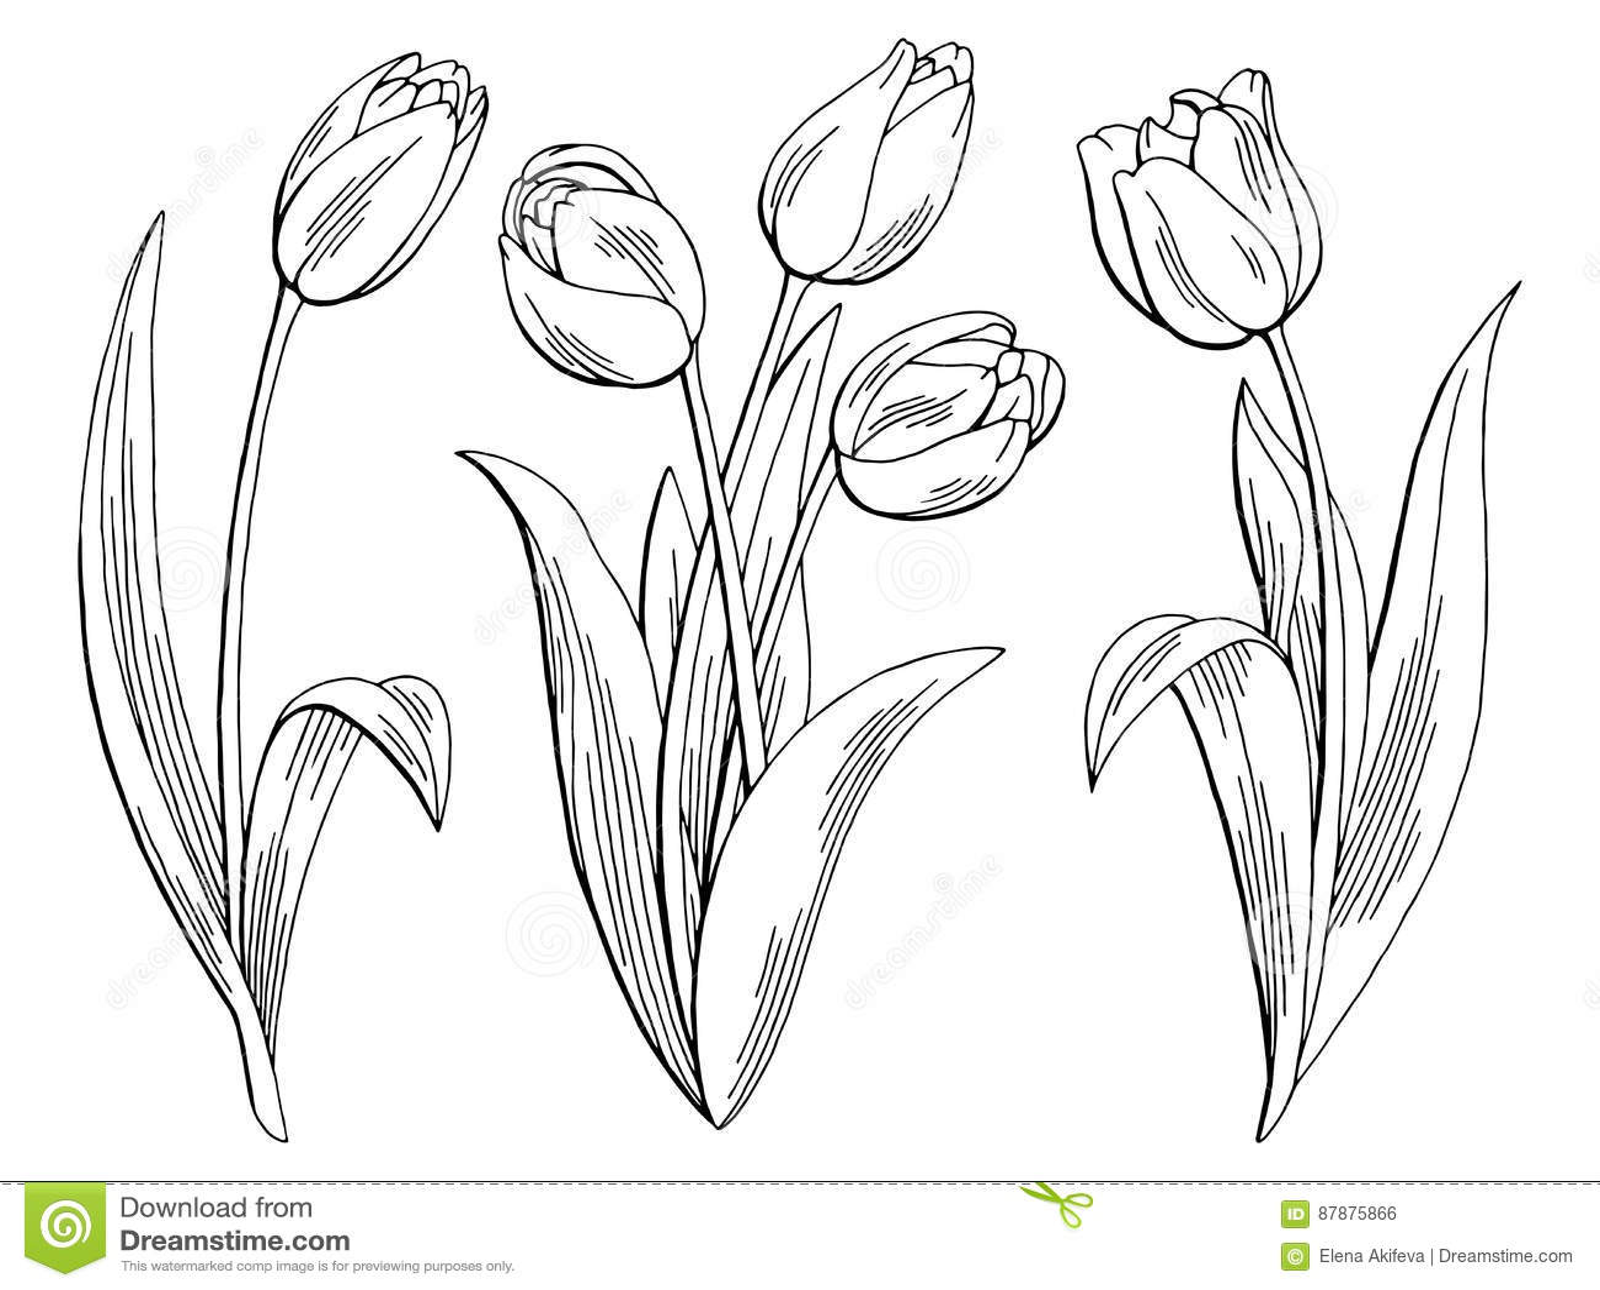 tulip flower graphic black white isolated sketch illustration stock